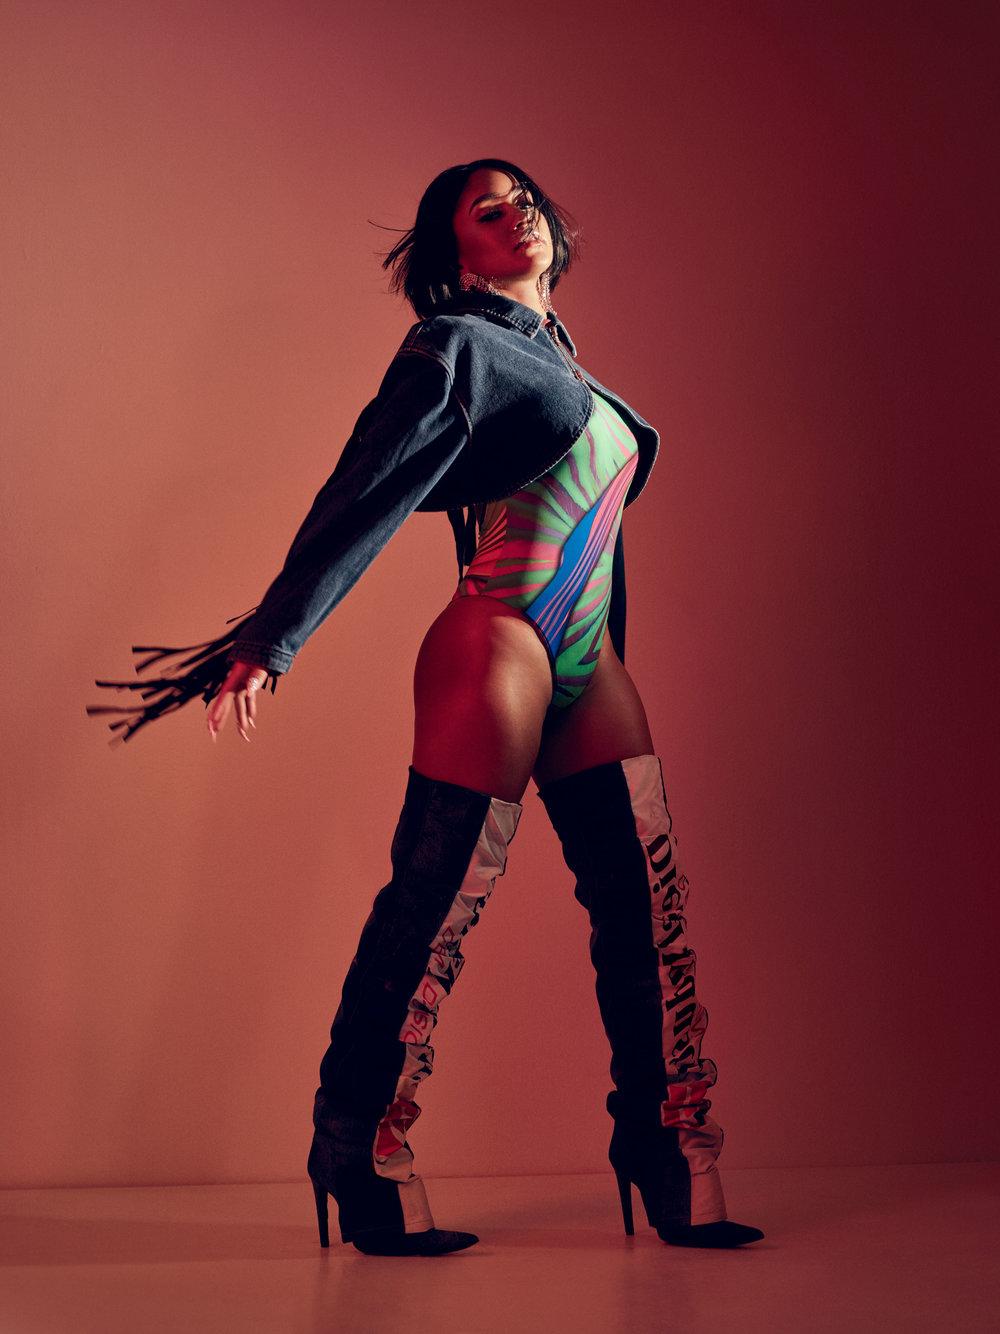 DIESEL     jacket and boots,   ADRIANA IGLESIAS     bodysuit, stylist's own earrings